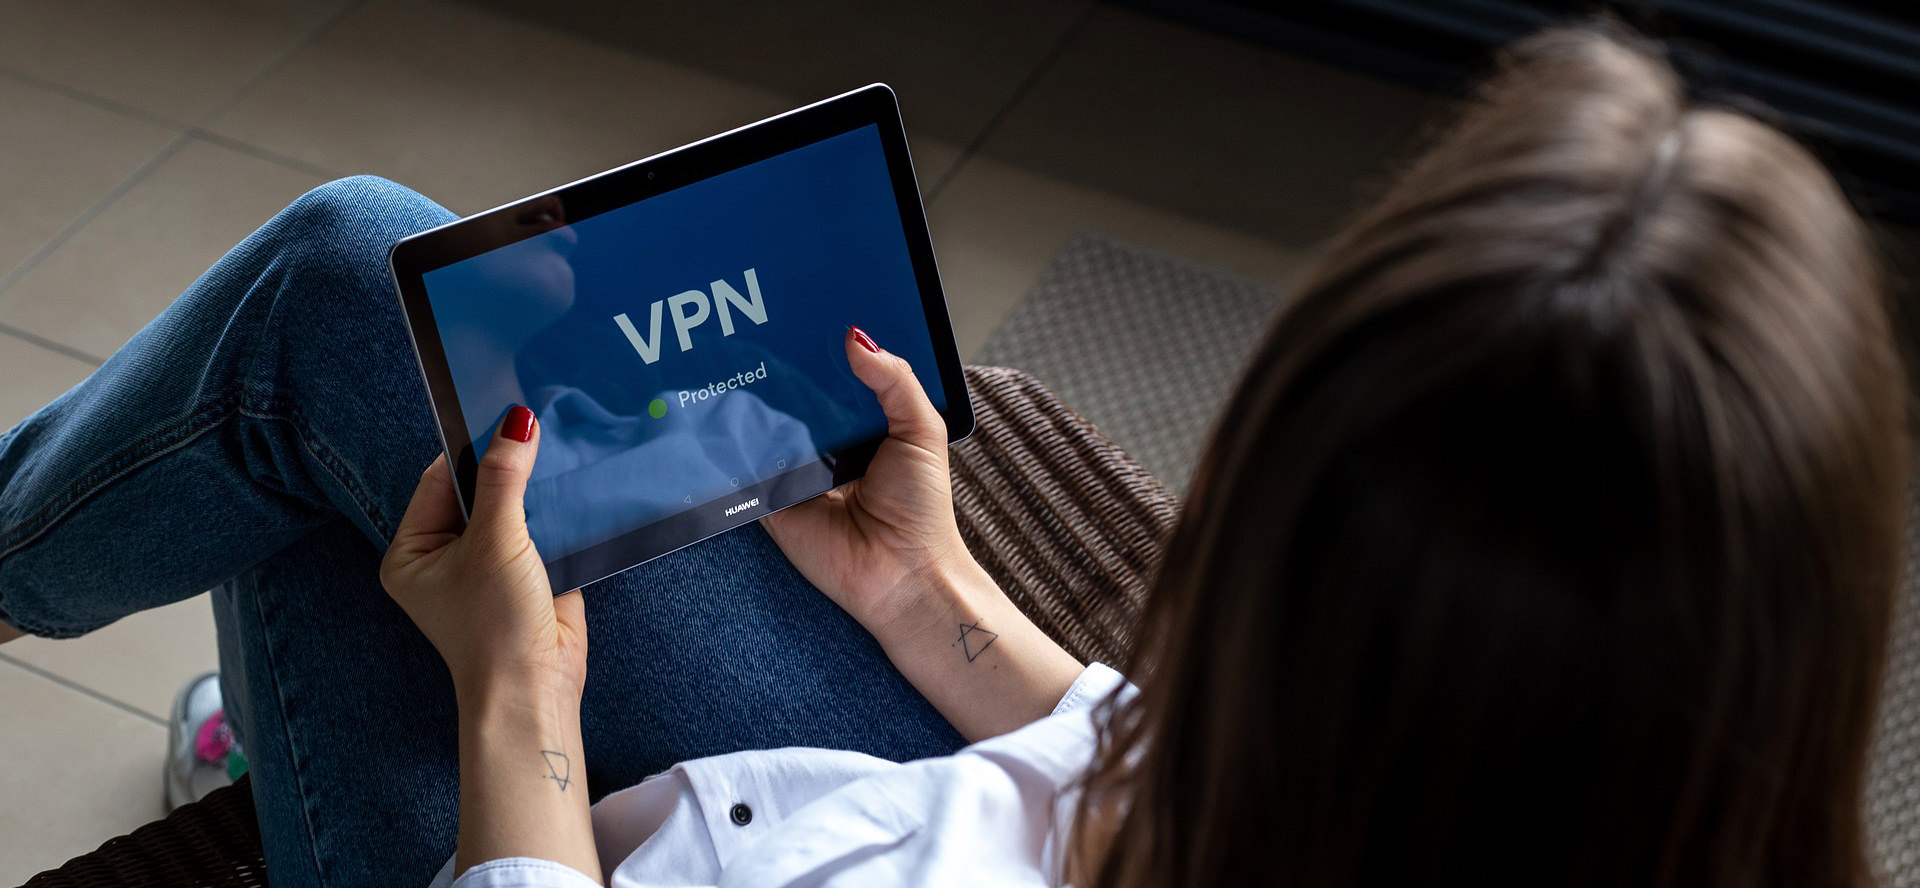 Utiliser un VPN en 2019